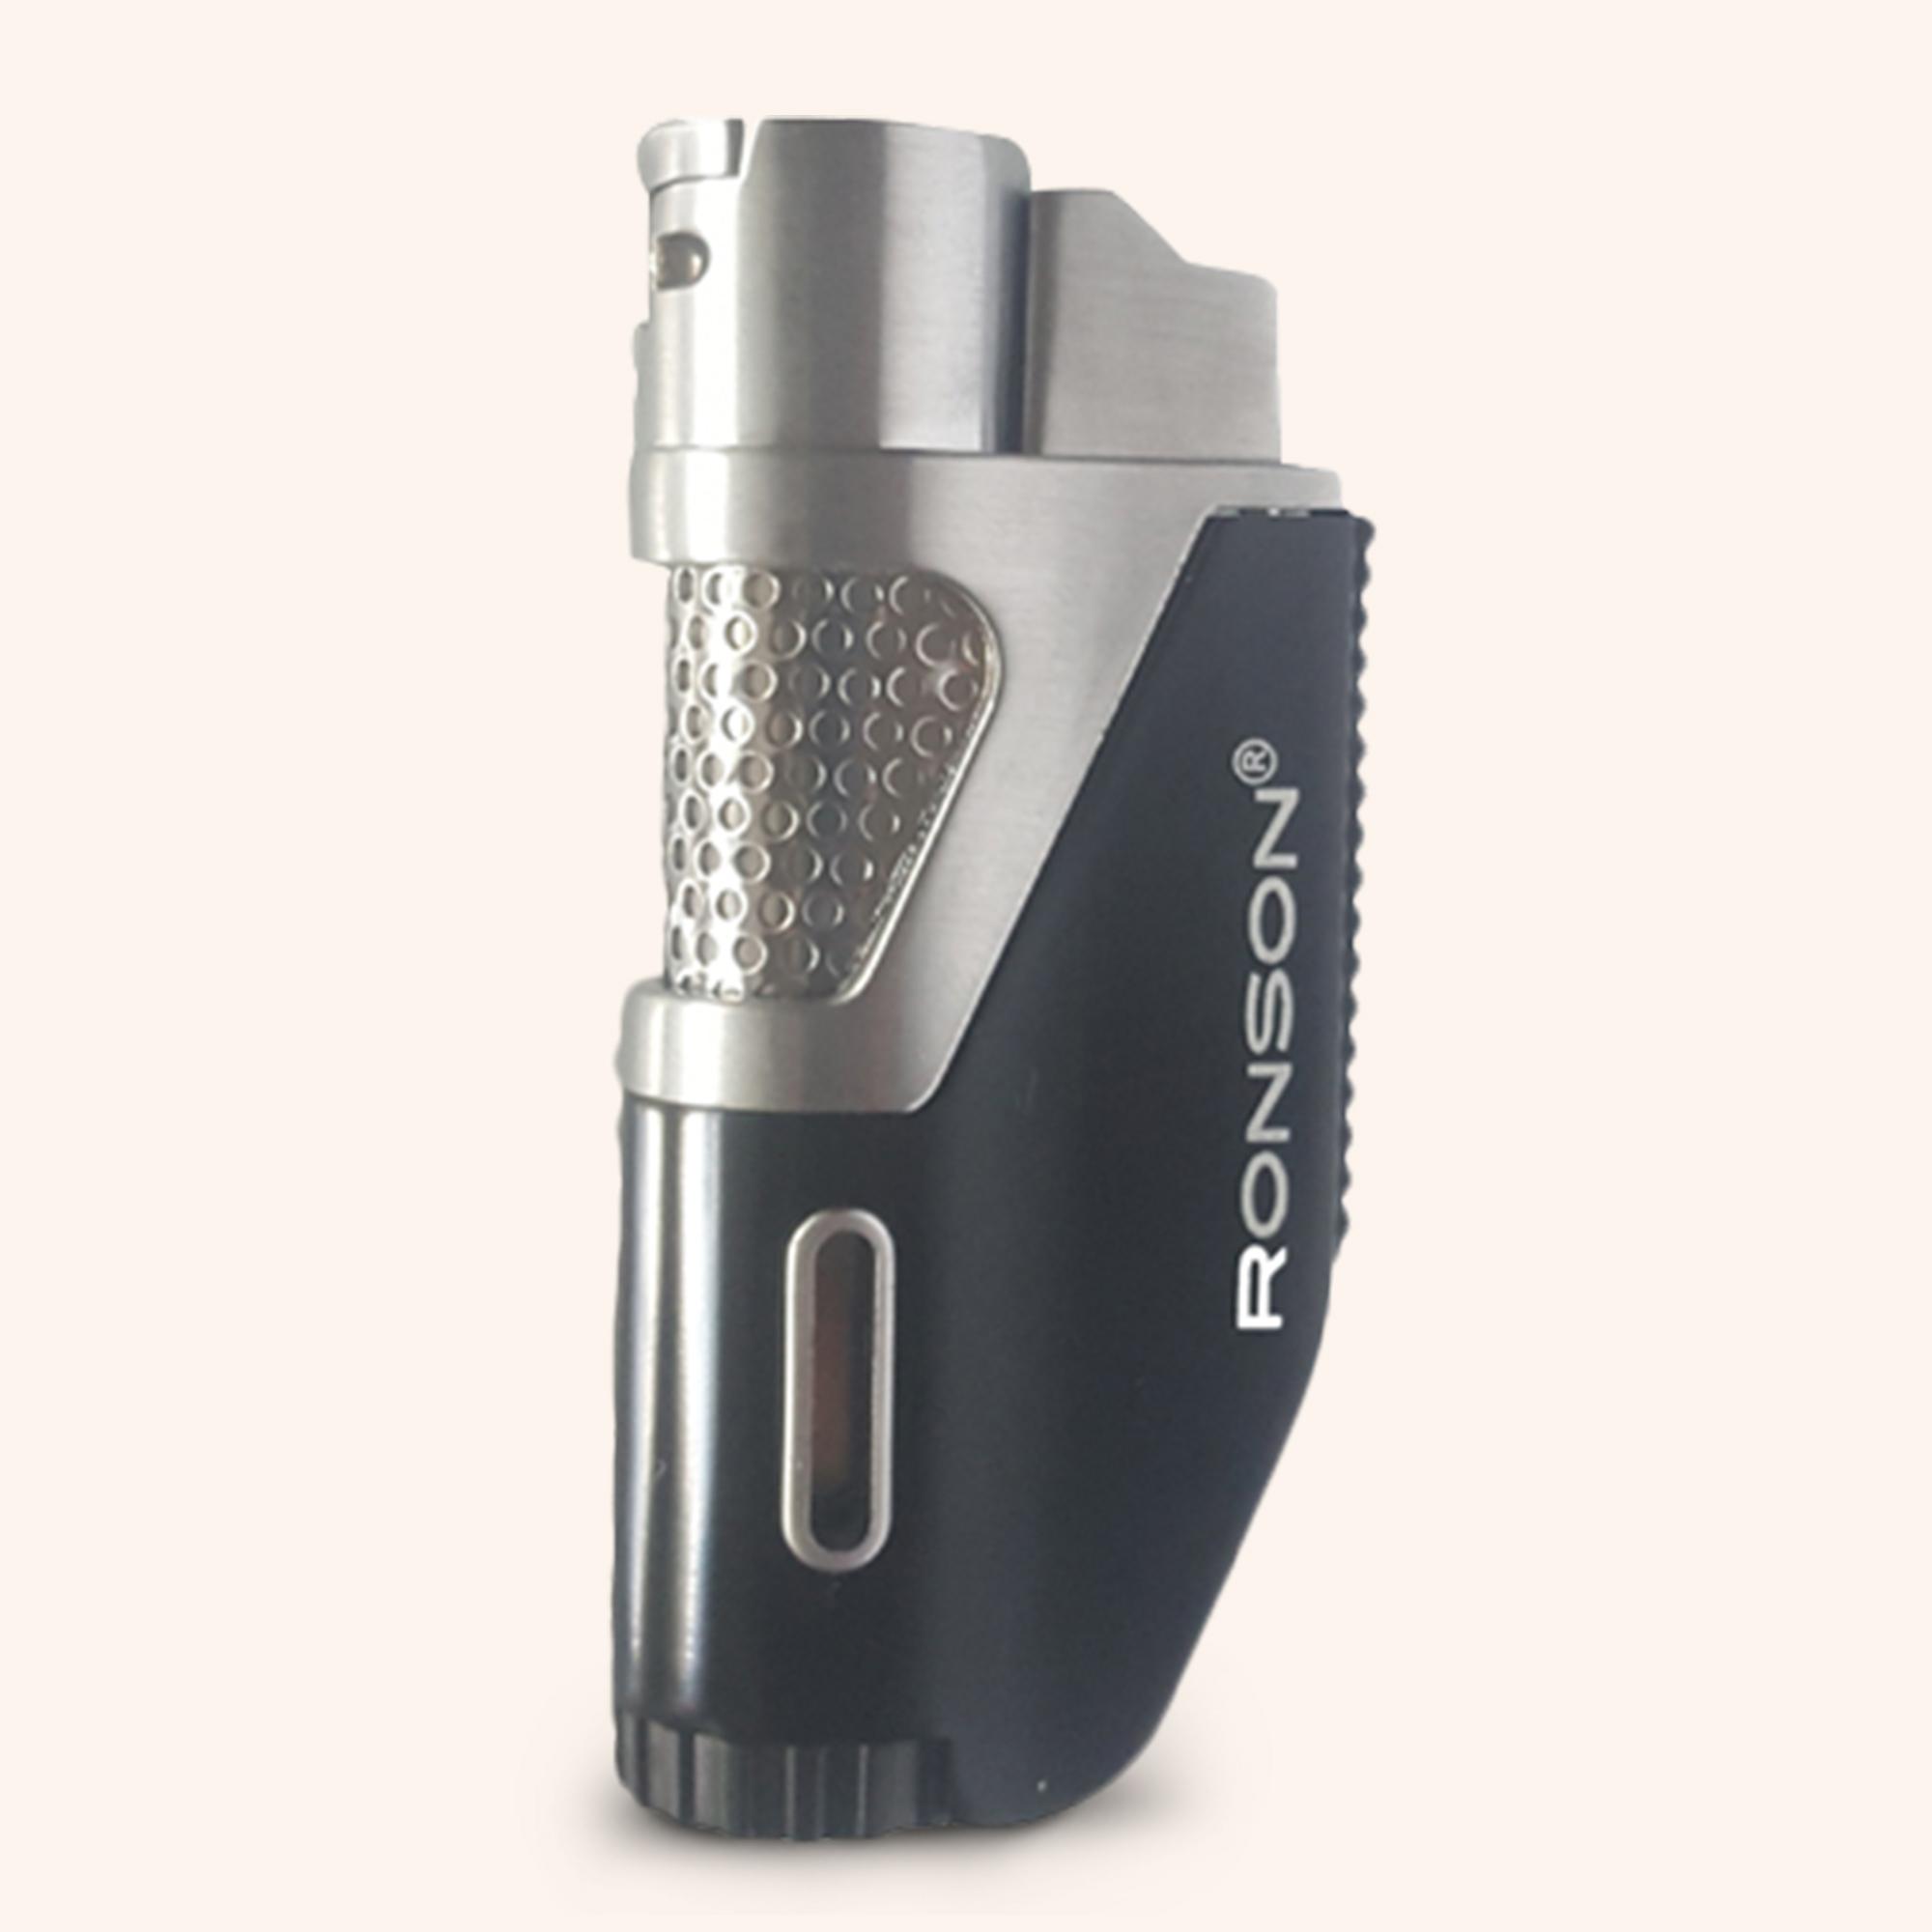 Ronson Windproof Lighter BR